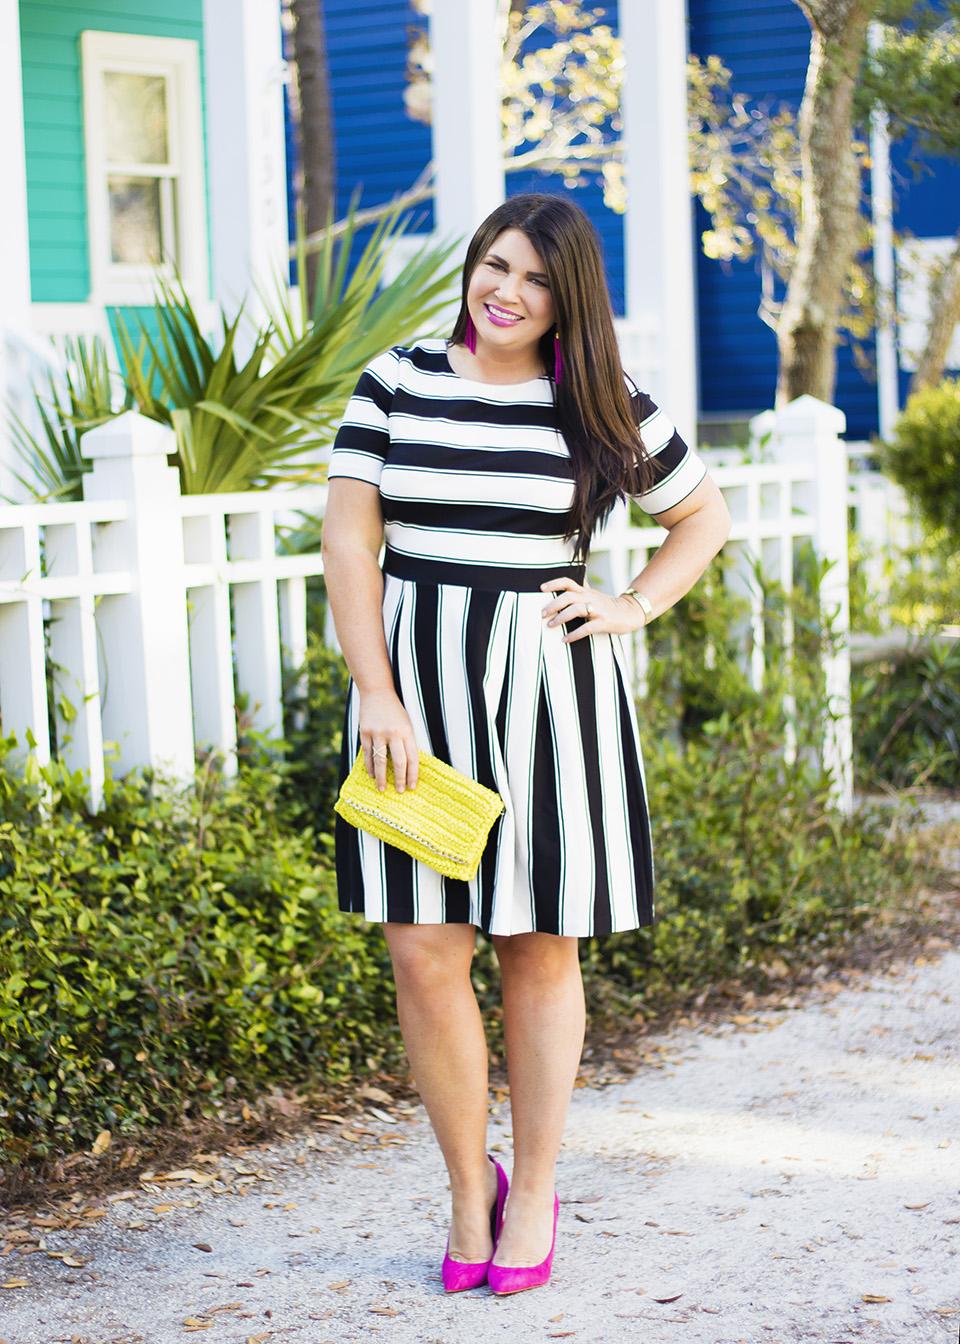 BW Ladylike Stripes 30A Street Style 6